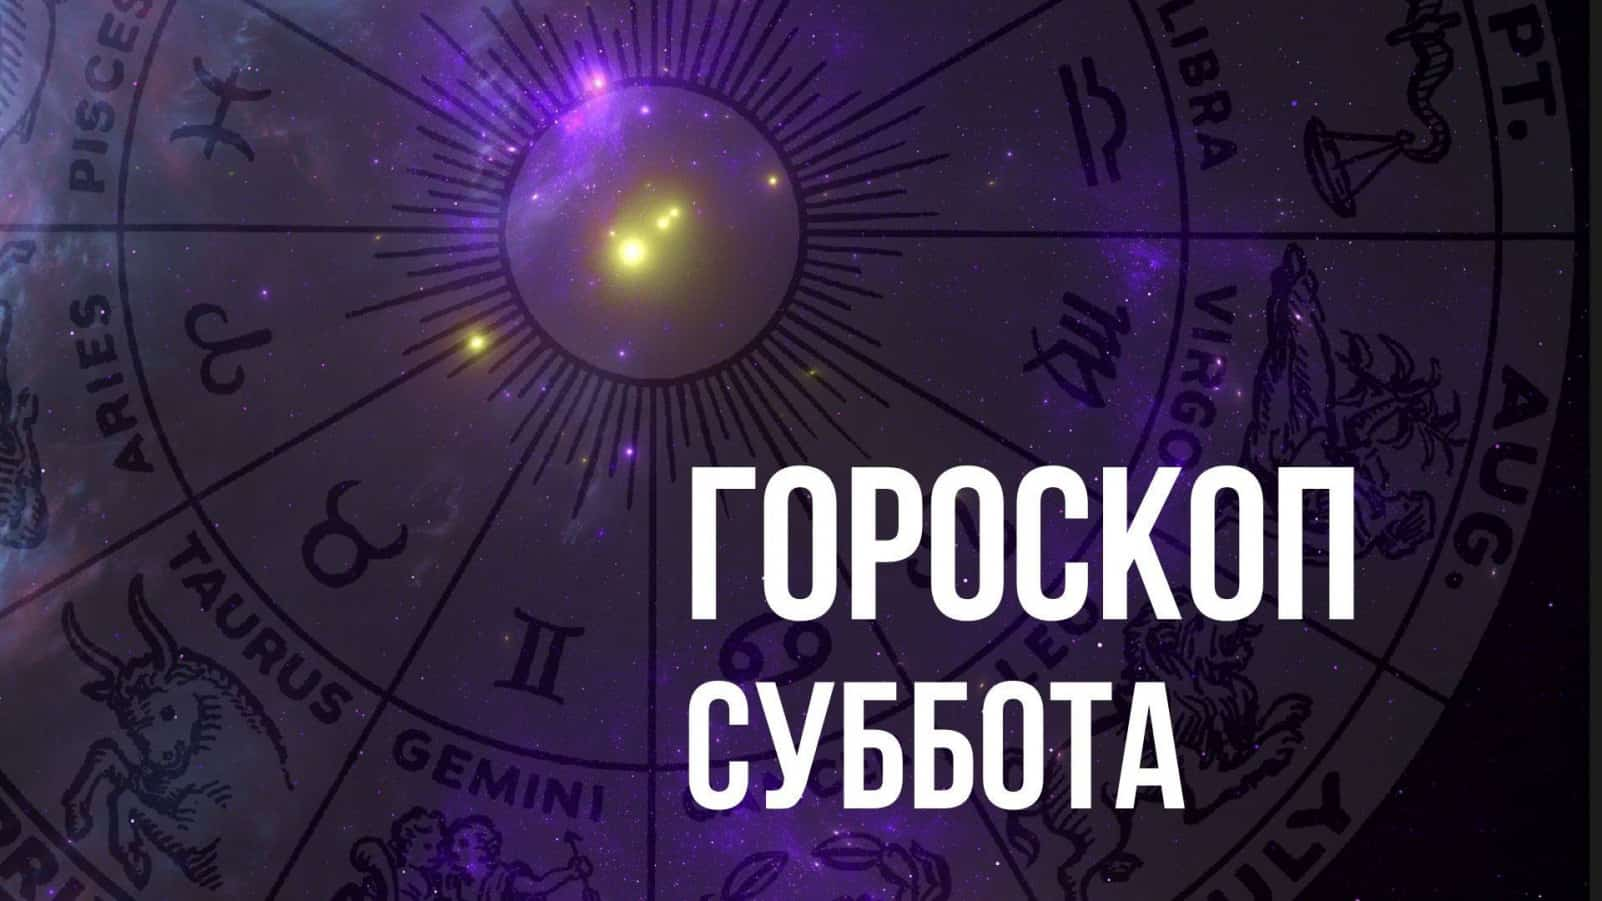 Гороскоп на субботу 21 августа для каждого знака Зодиака